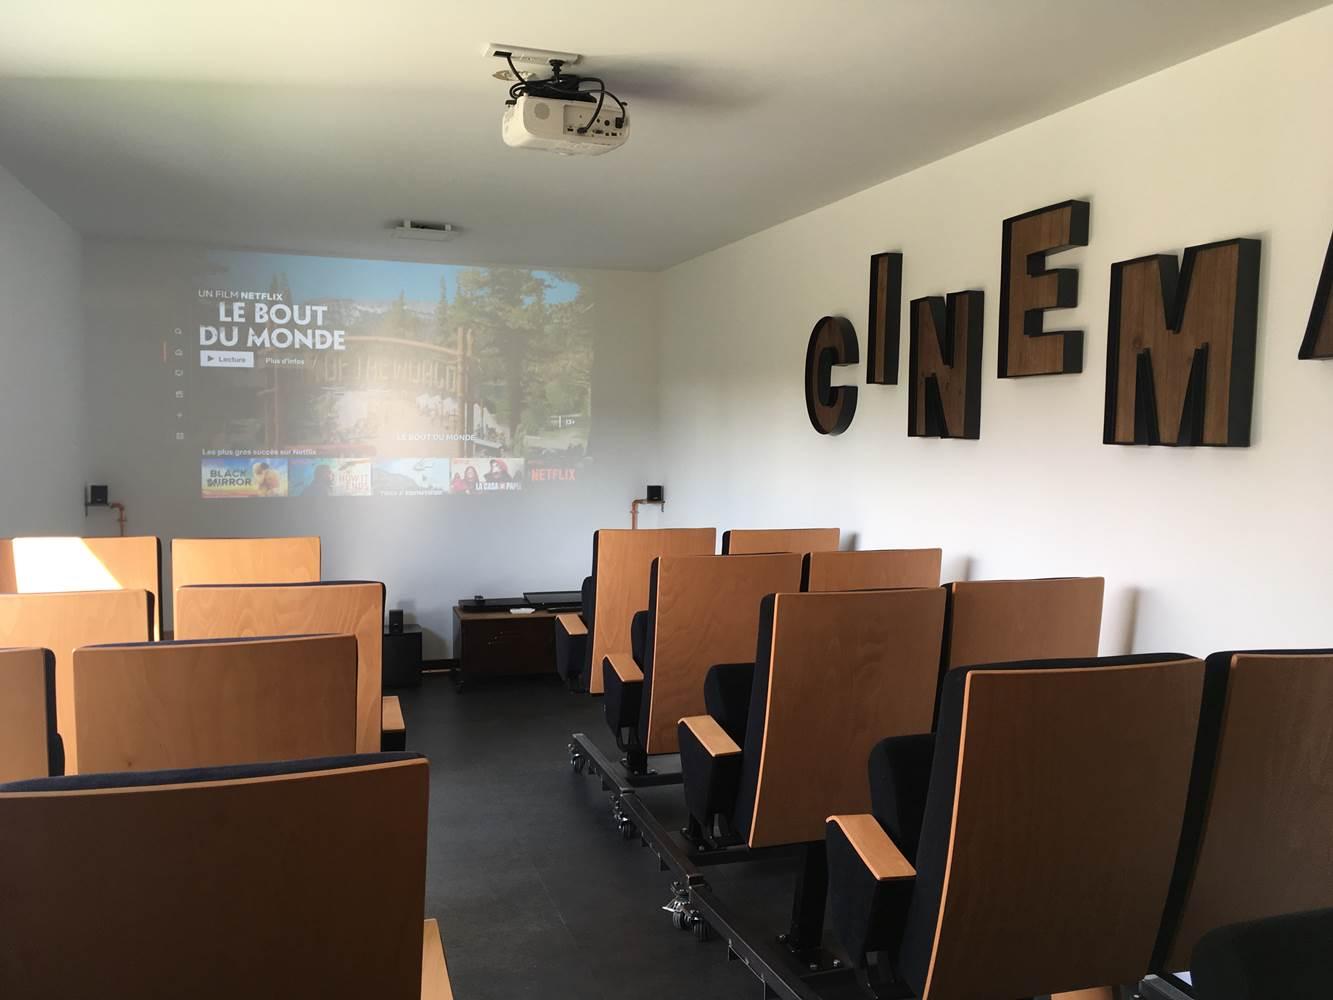 villa charles & ashton salle cinéma ps4 netflix ©